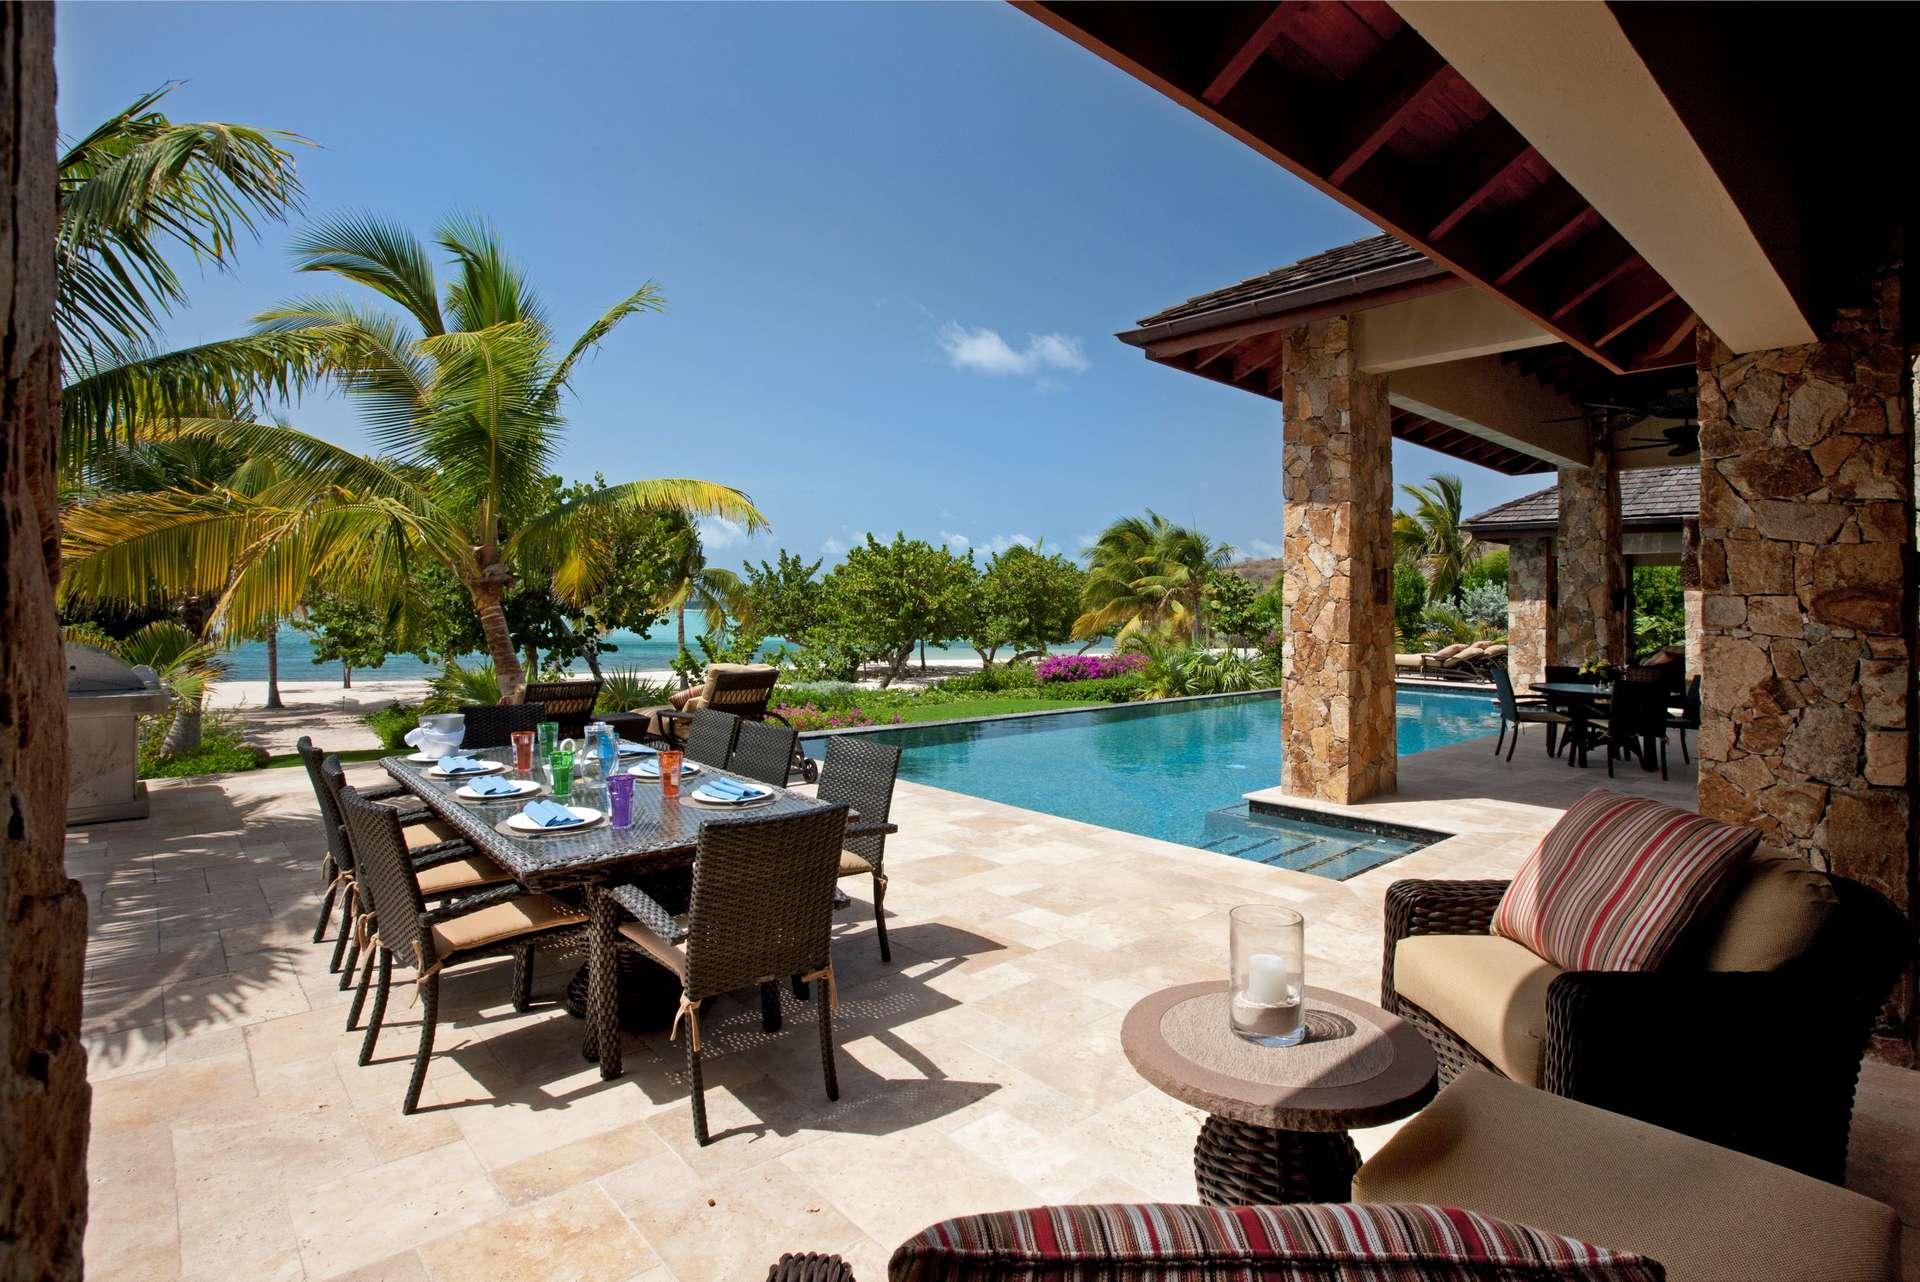 Luxury villa rentals caribbean - British virgin islands - Virgin gorda - Bella Beach Villa | Oil Nut Bay - Image 1/11